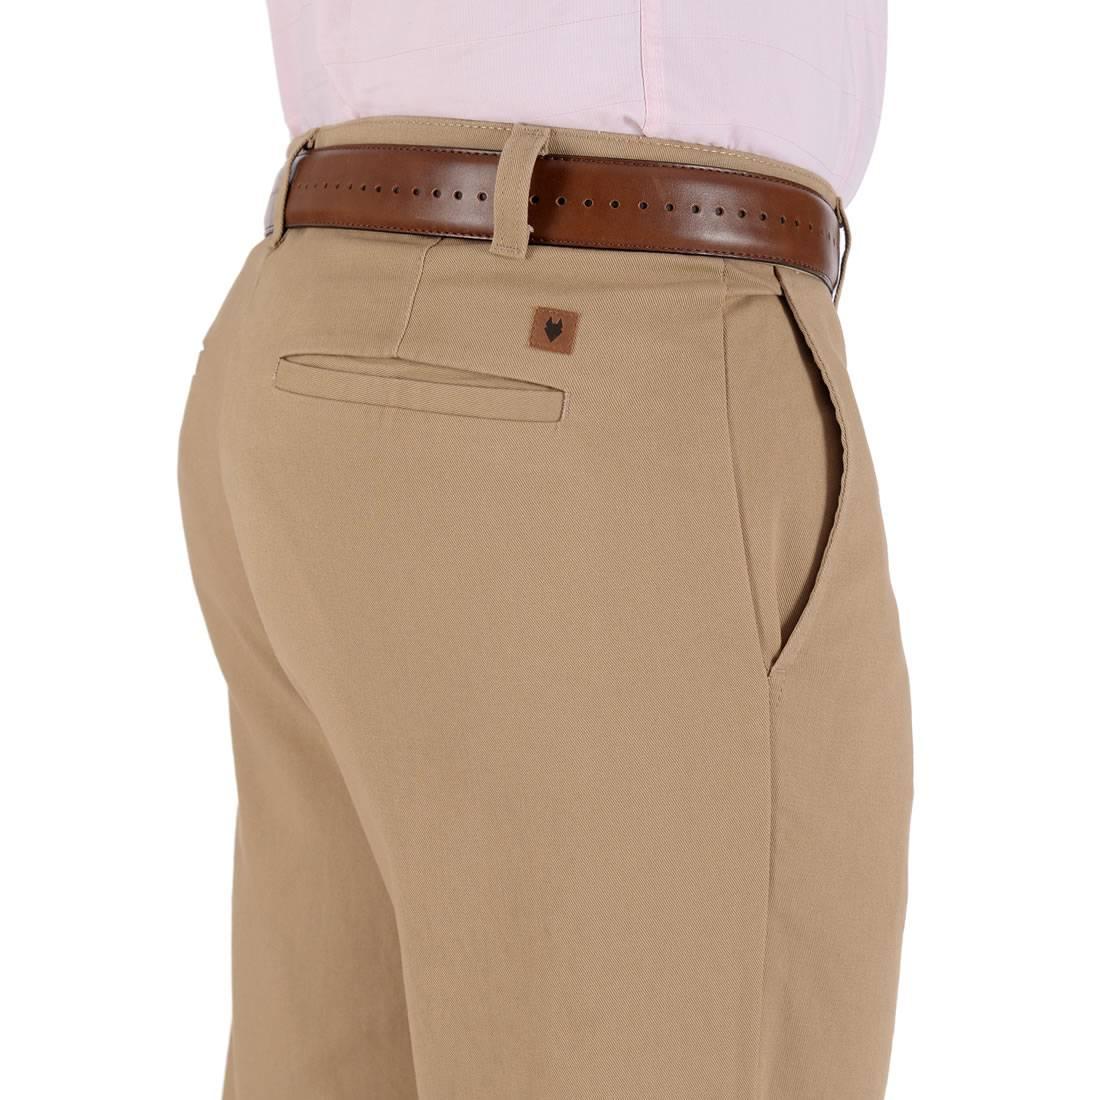 010811074467-04-Pantalon-Casual-Sin-Pinzas-Classic-Fit-Kaki-yale